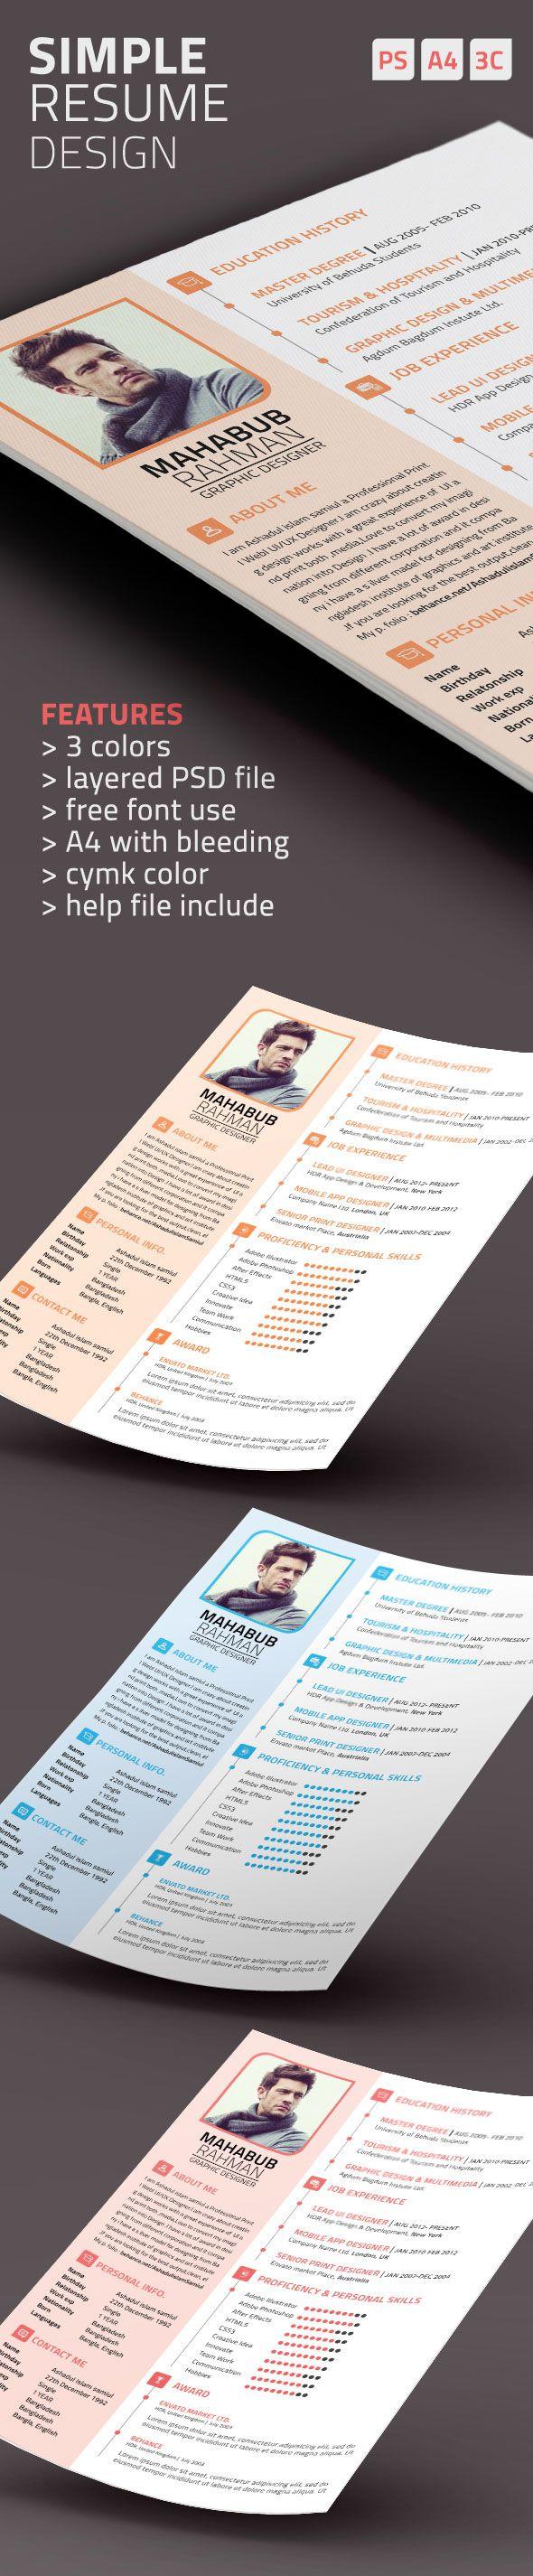 Simple Resume Templatemy Cms Web Design Pinterest Simple